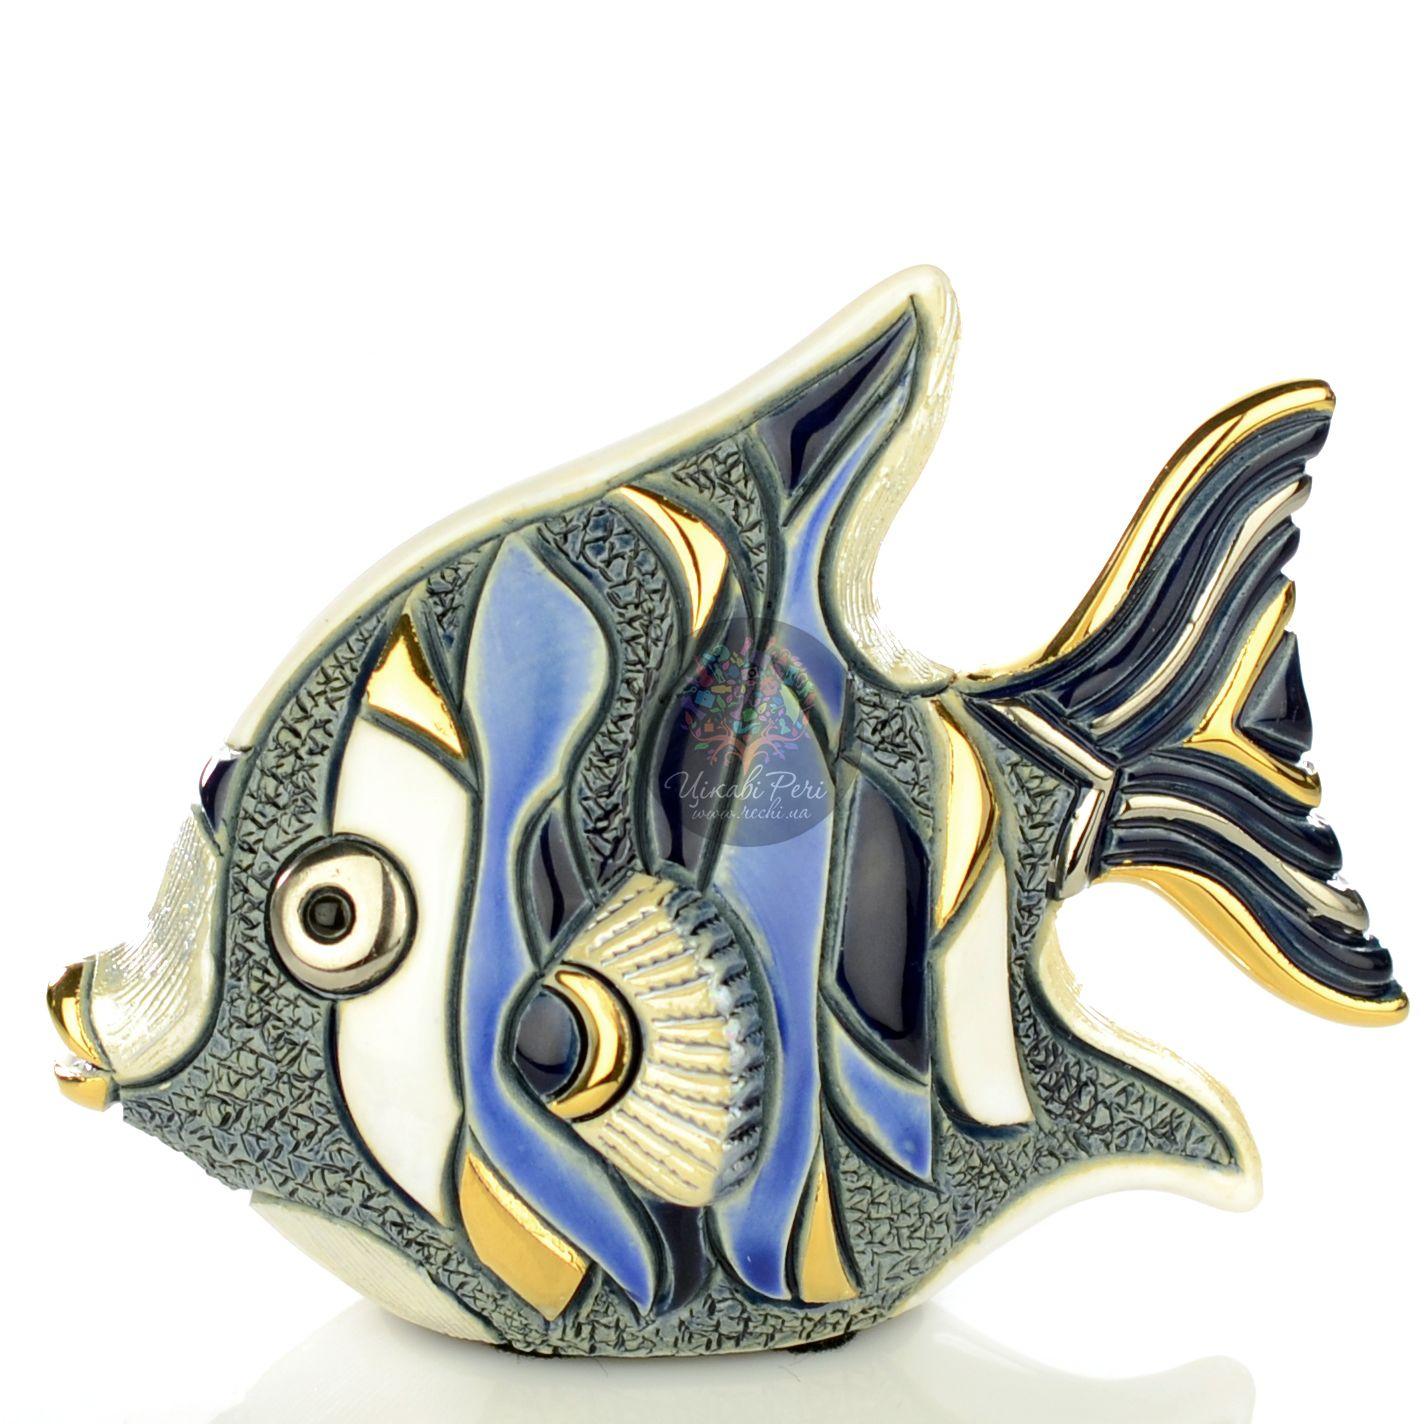 Фигурка De Rosa Rinconada Families Рыба-Ангел серо-бело-синяя